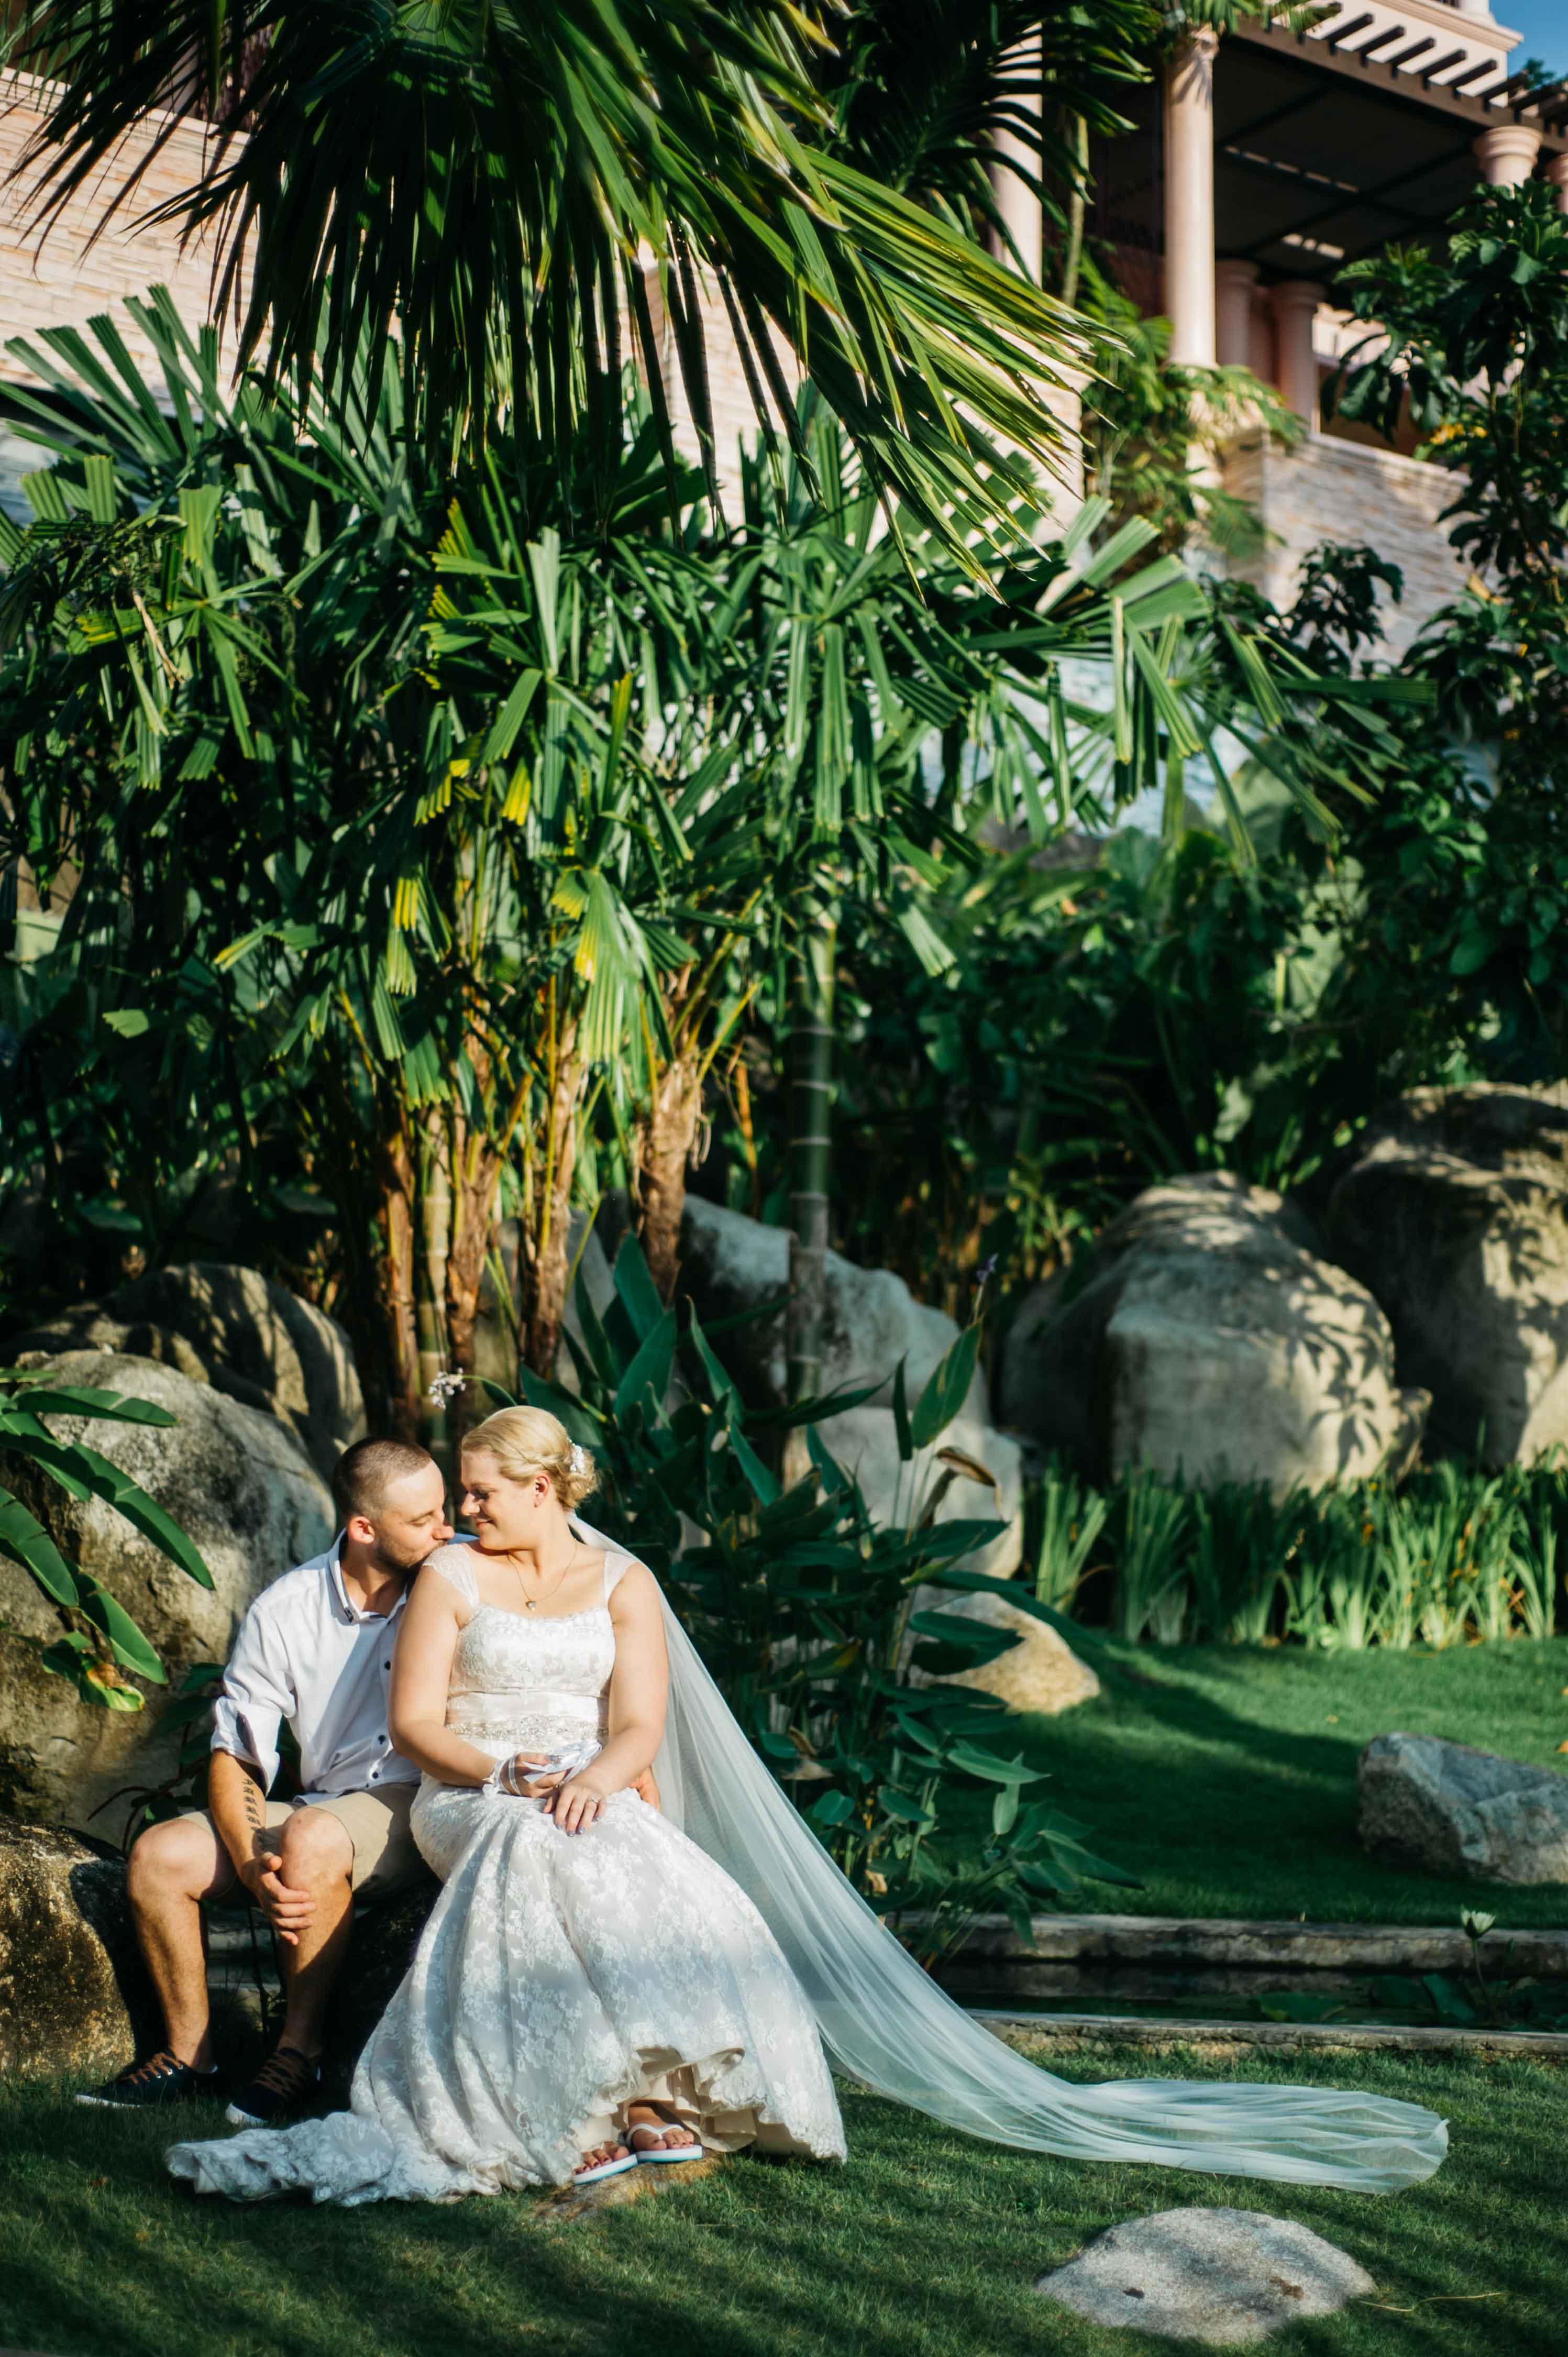 Centara-Grand-Beach-Resort-Kahlia-Luke-Wedding-09